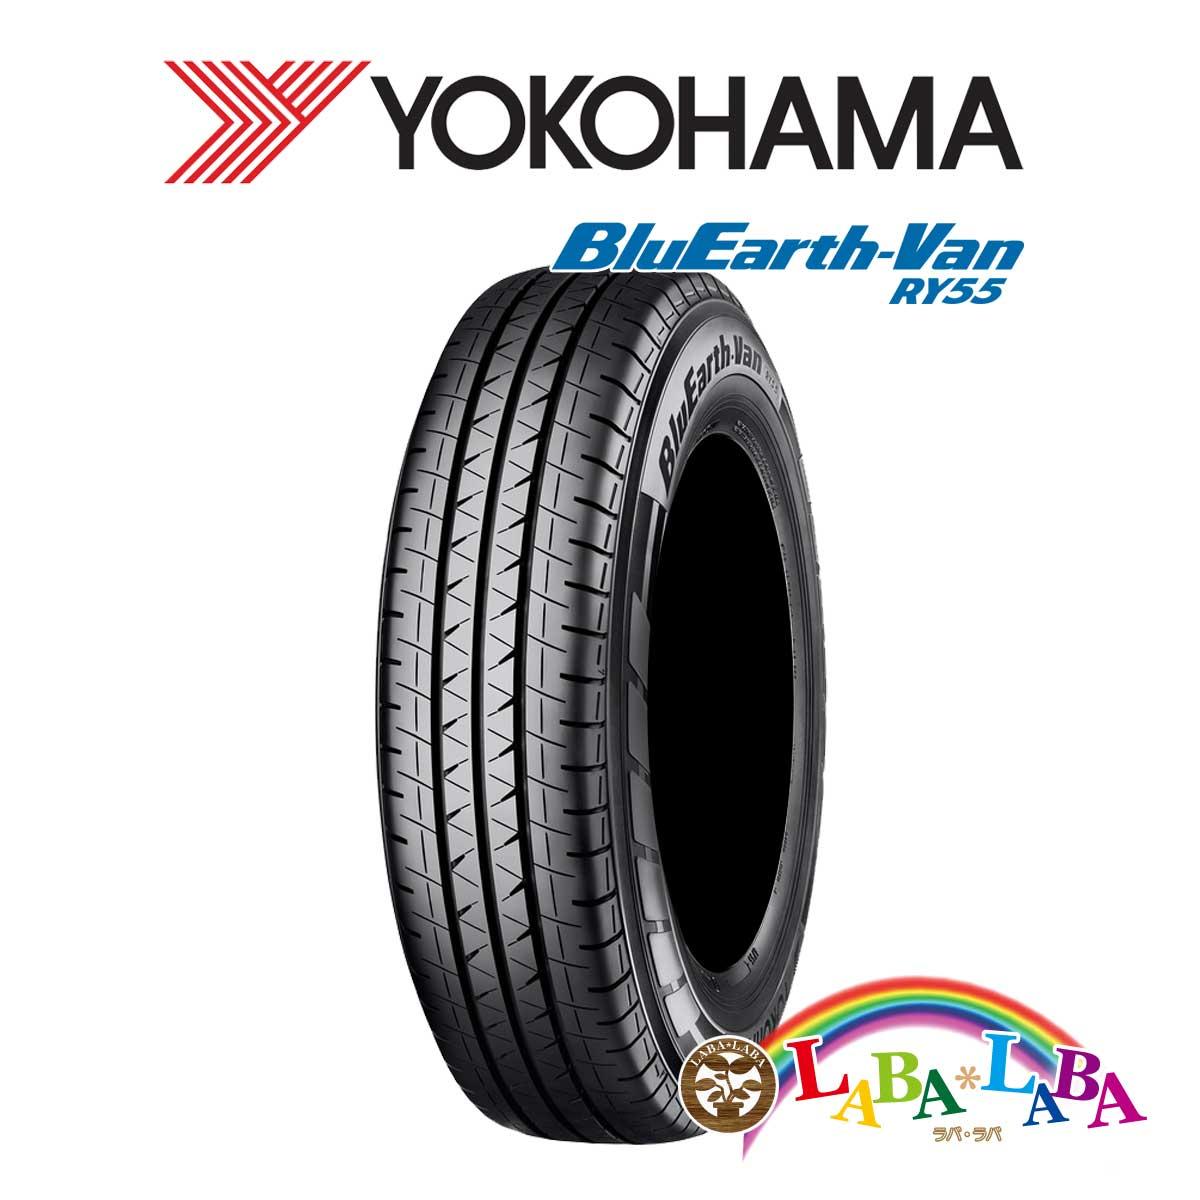 <title>送料無料 国産タイヤ サマータイヤ 人気上昇中 新品 タイヤのみ 4本SET YOKOHAMA ヨコハマ BluEarth-Van ブルーアース RY55 165 80R13 90 88N バン LT 4本セット</title>